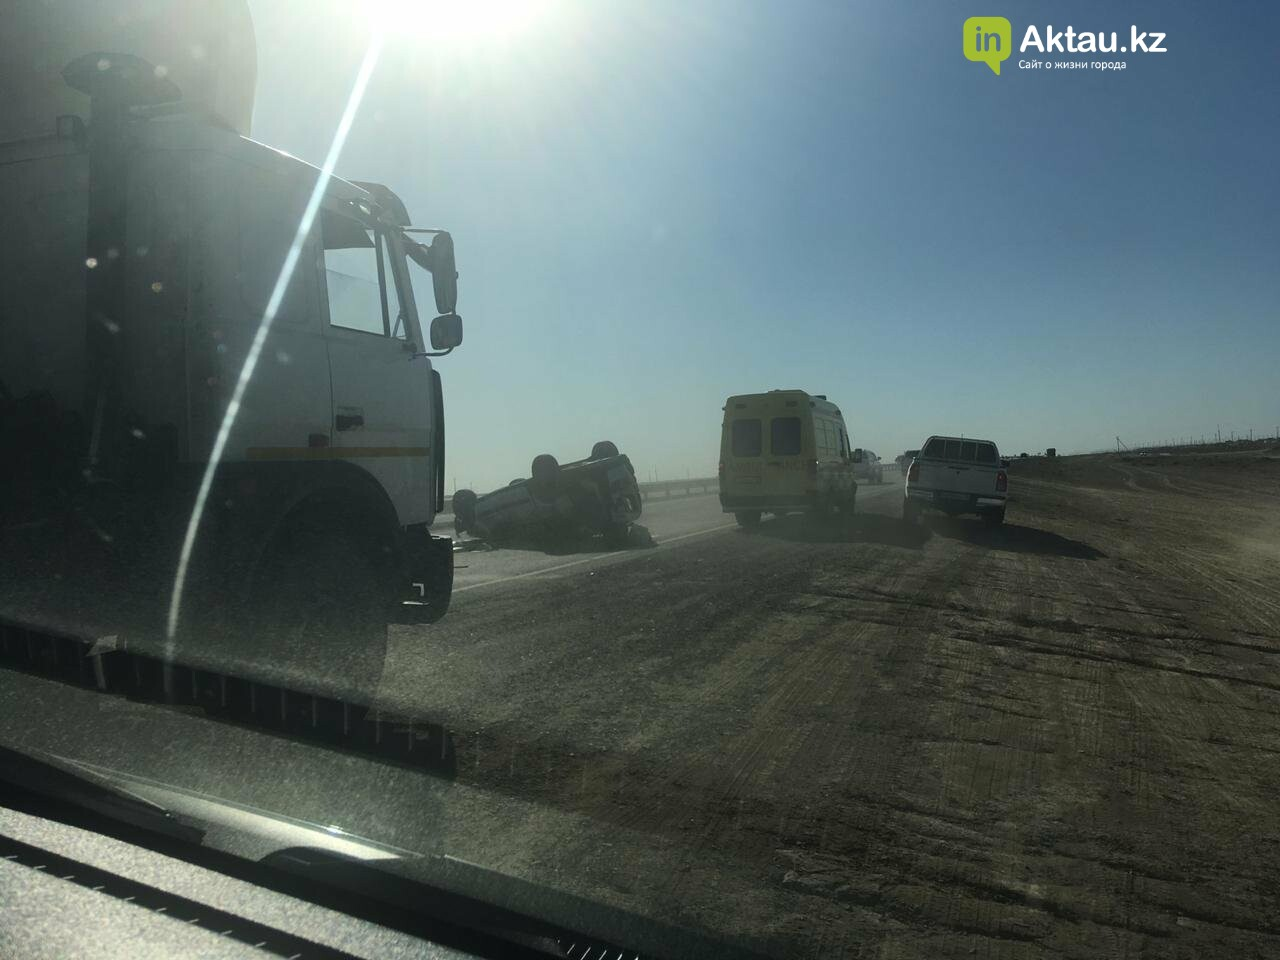 Три человека пострадали в аварии на трассе Актау-Жанаозен, фото-1